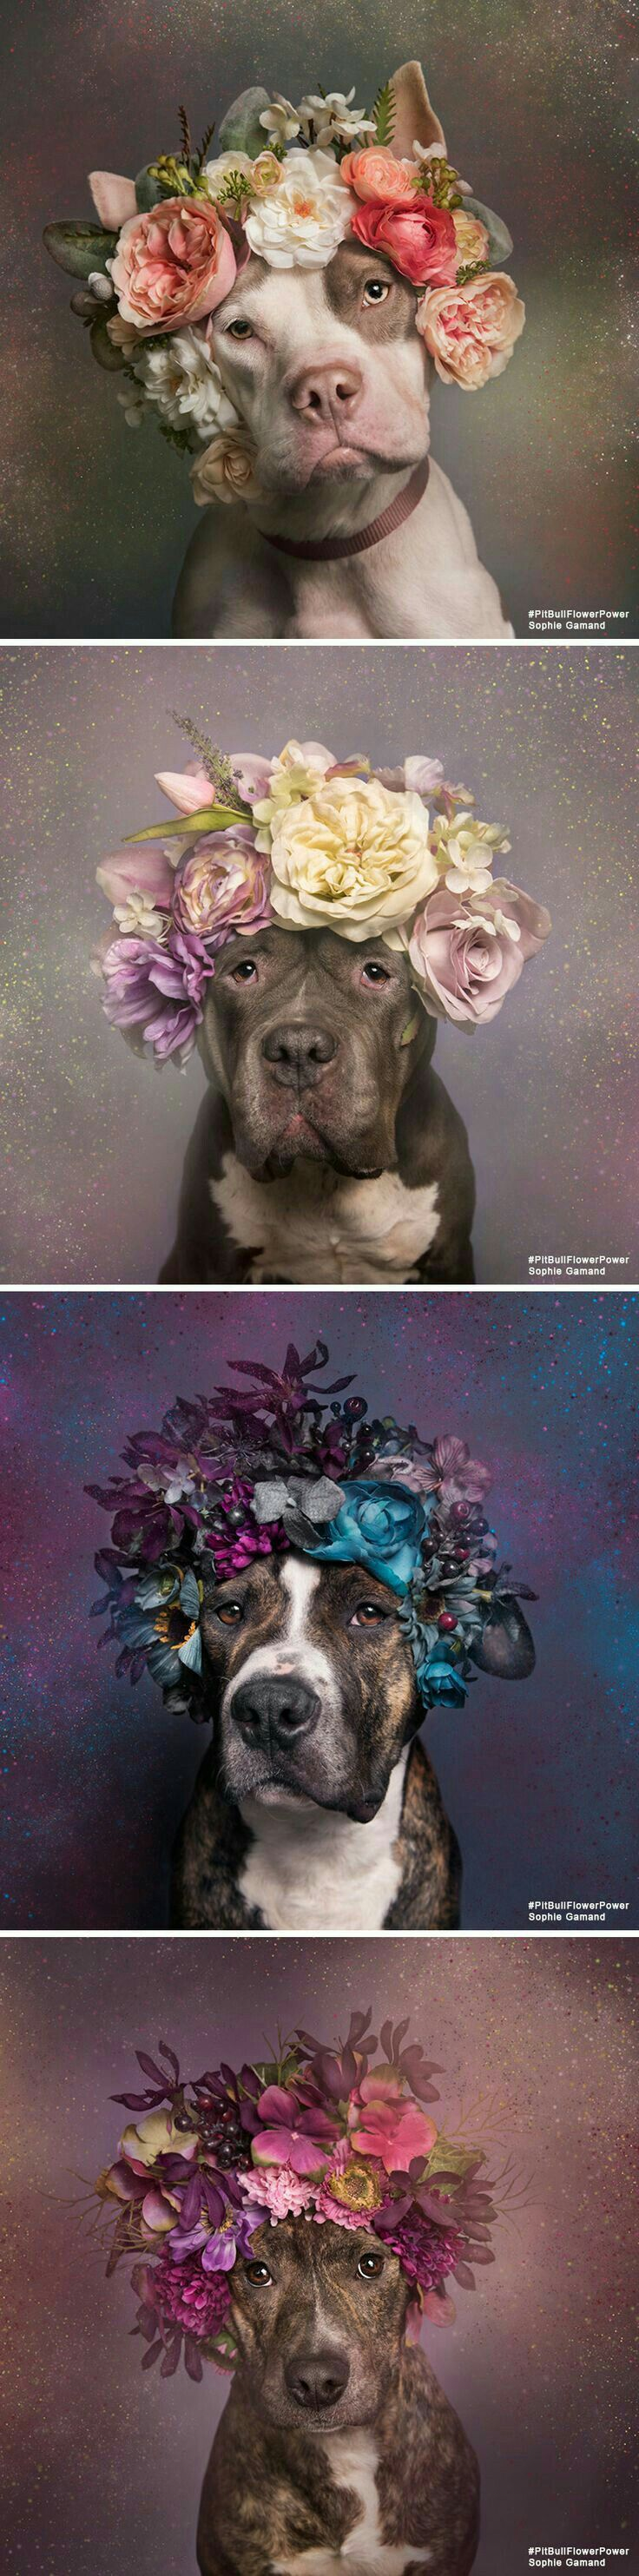 30 best Kim Hartz grapher images on Pinterest